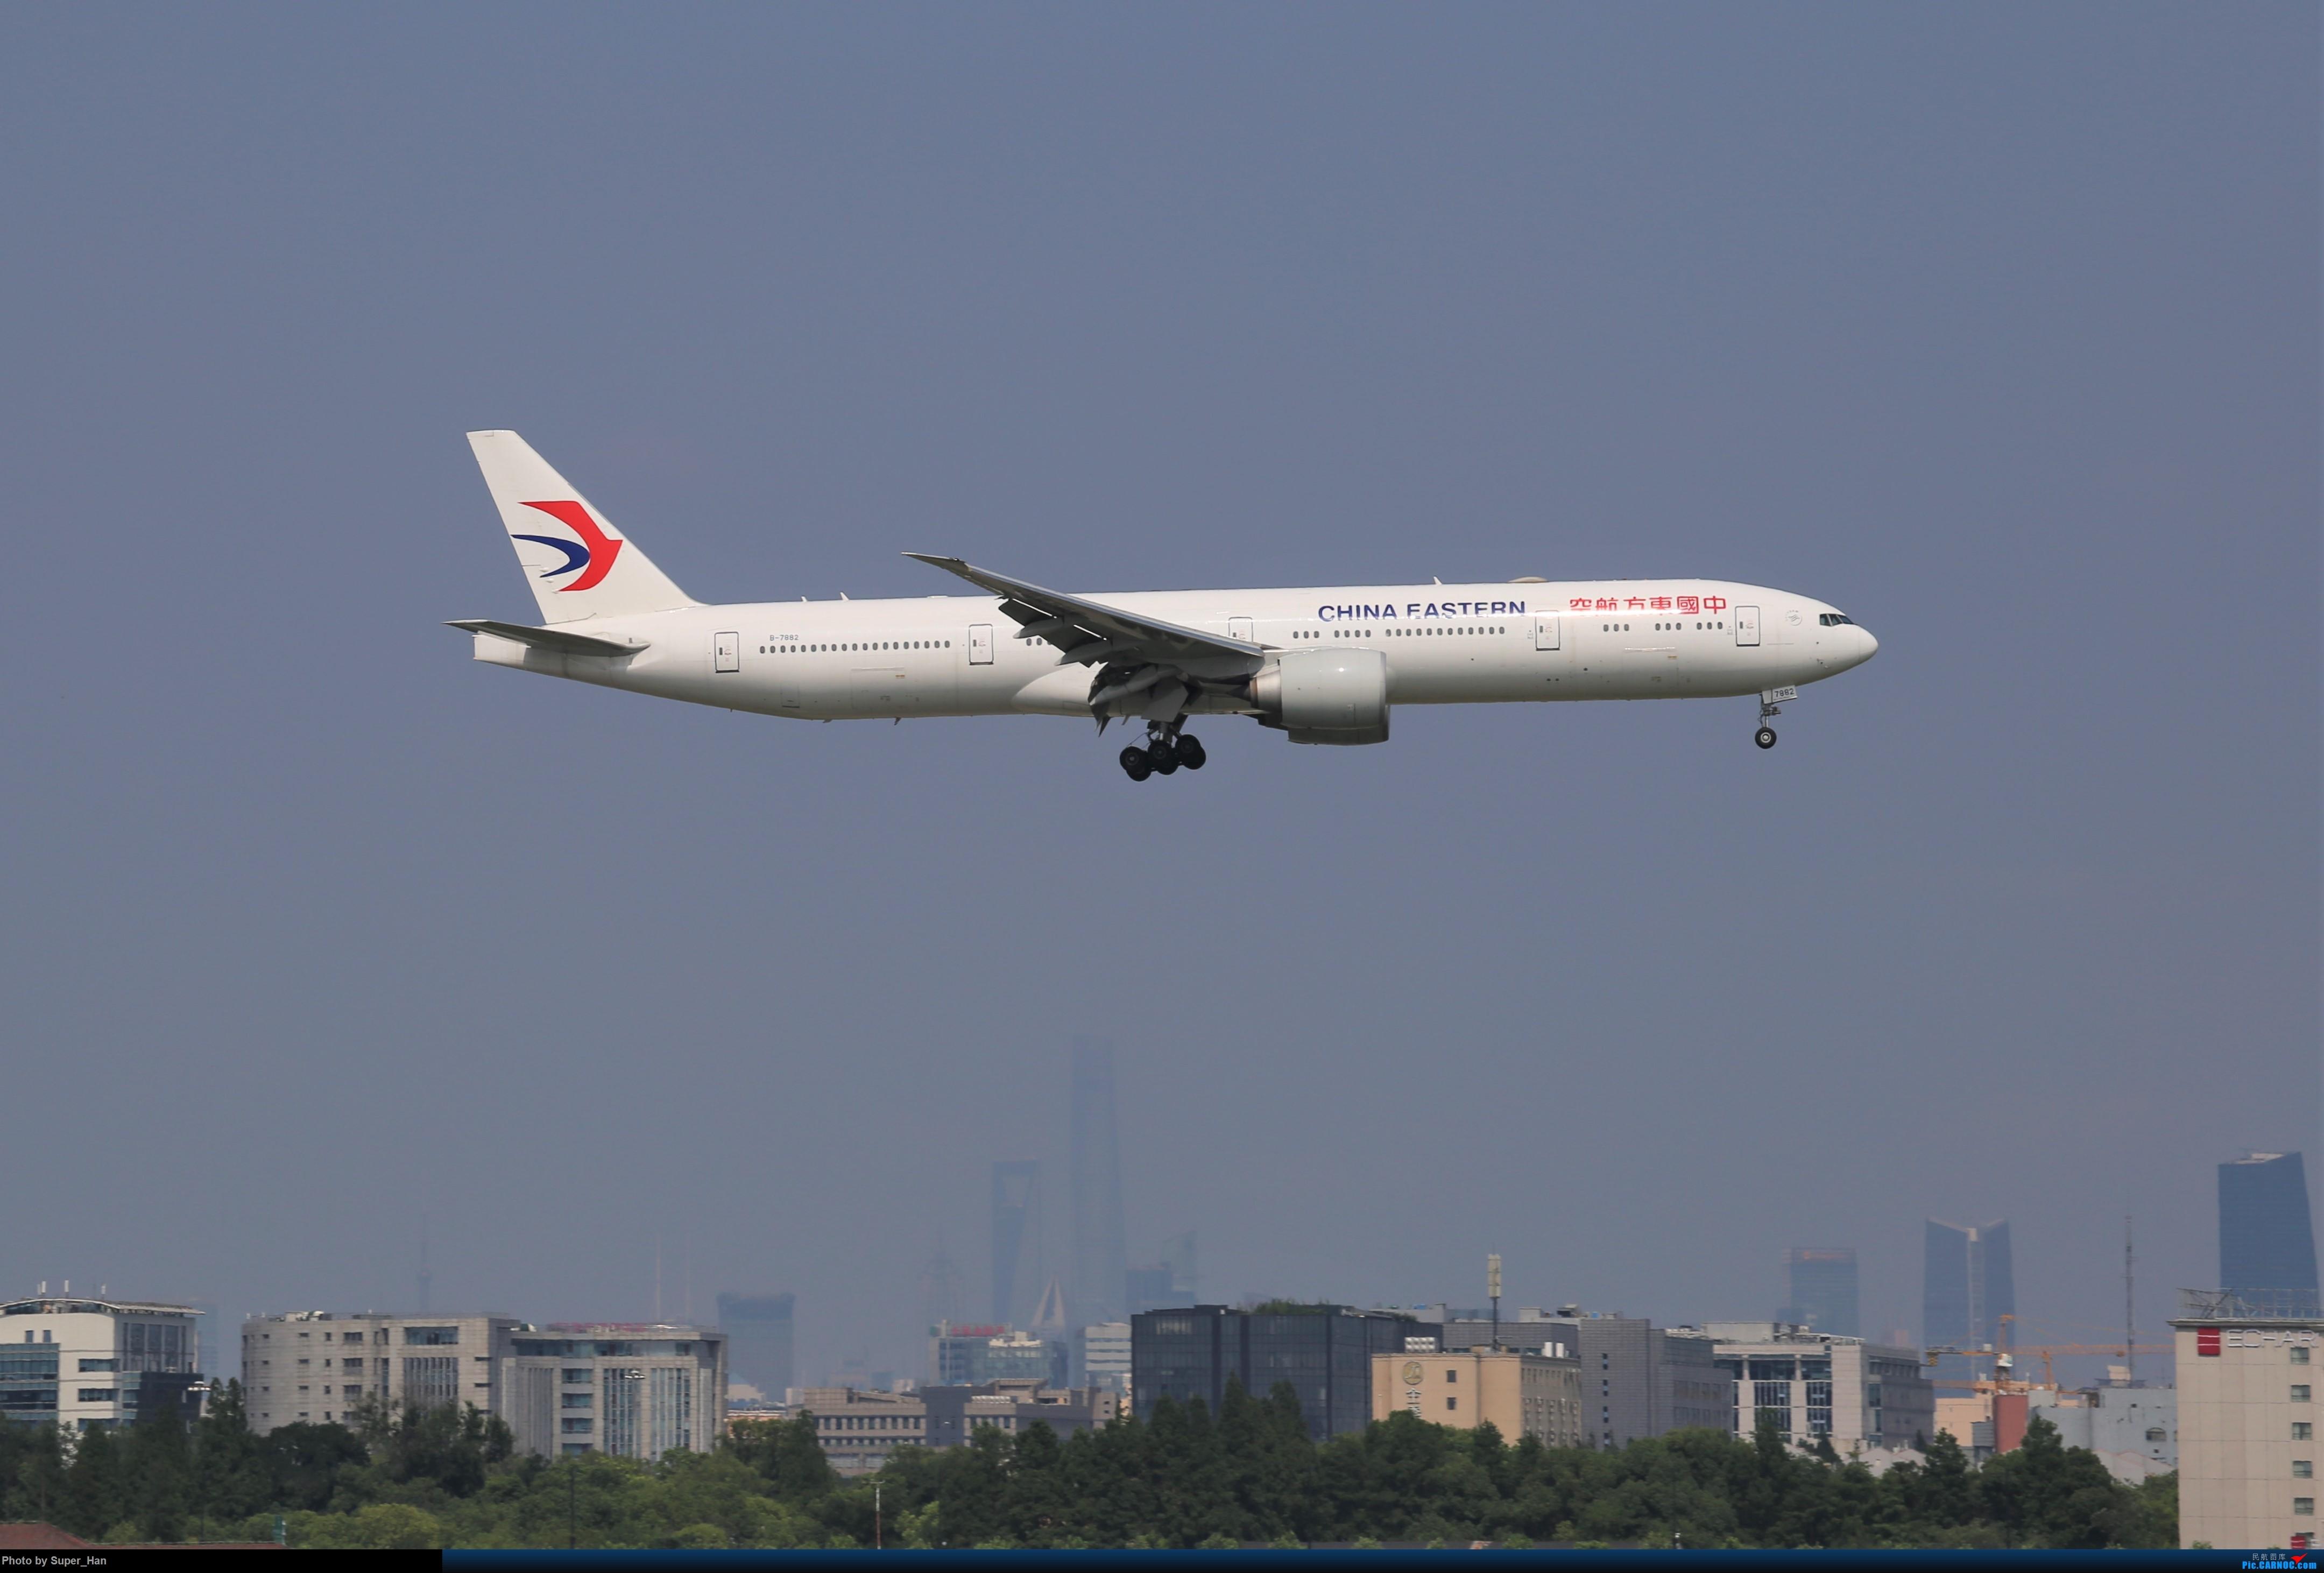 Re:[原创]【杭州飞友会】浦东之上 BOEING 777-300ER B-7882 中国上海虹桥国际机场